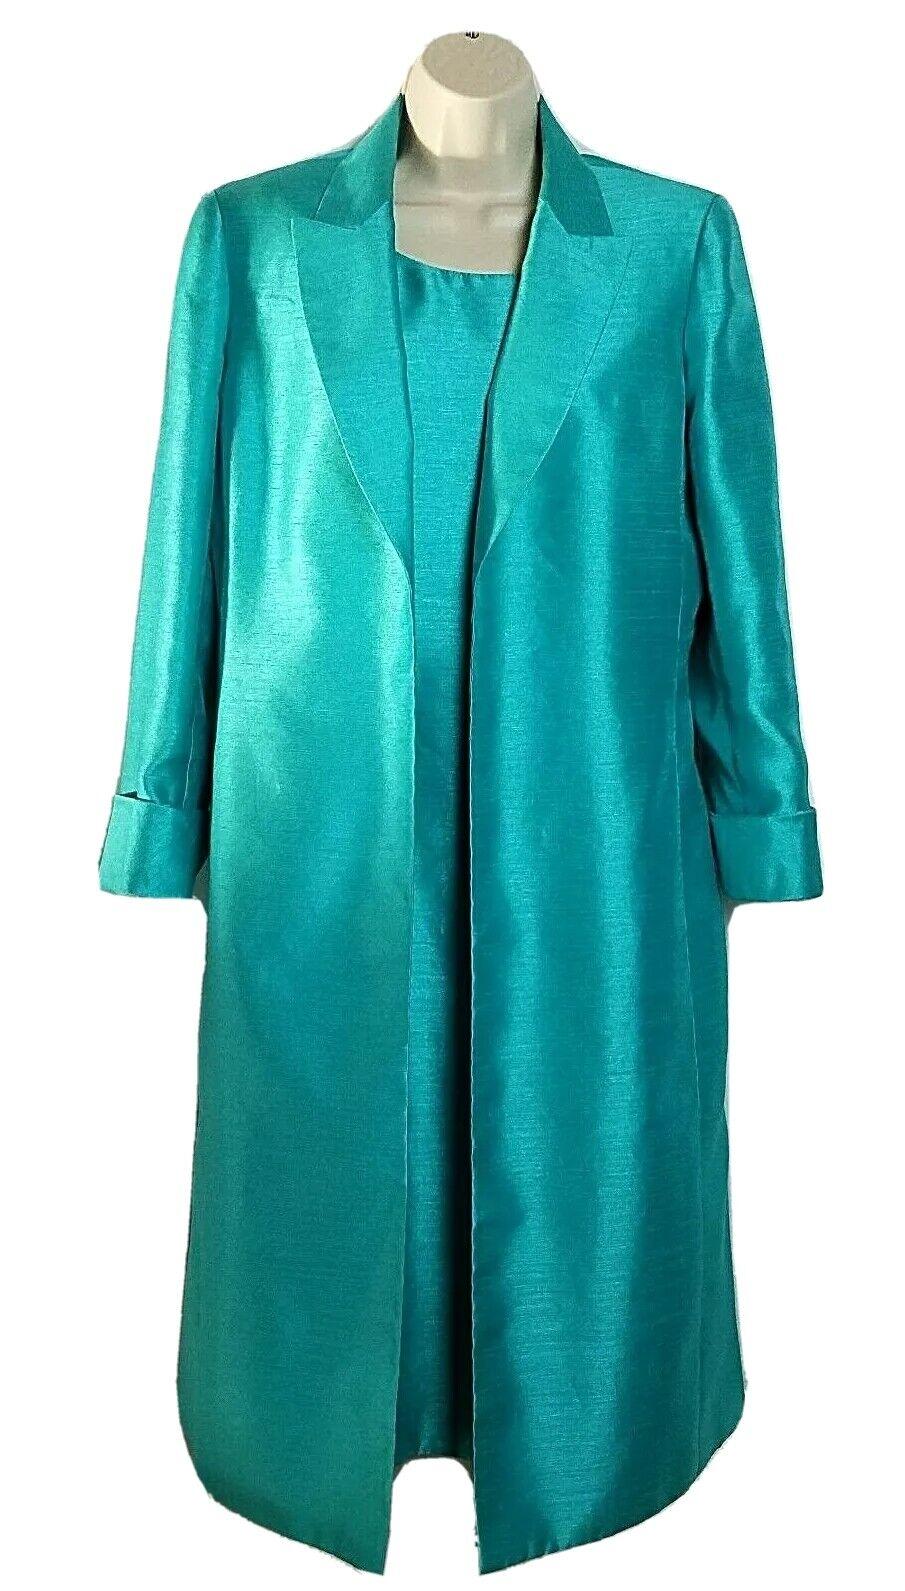 Suit Studio Womens Dress & Jacket 8 Teal / Turquoise Formal Evening Wear 2 Piece